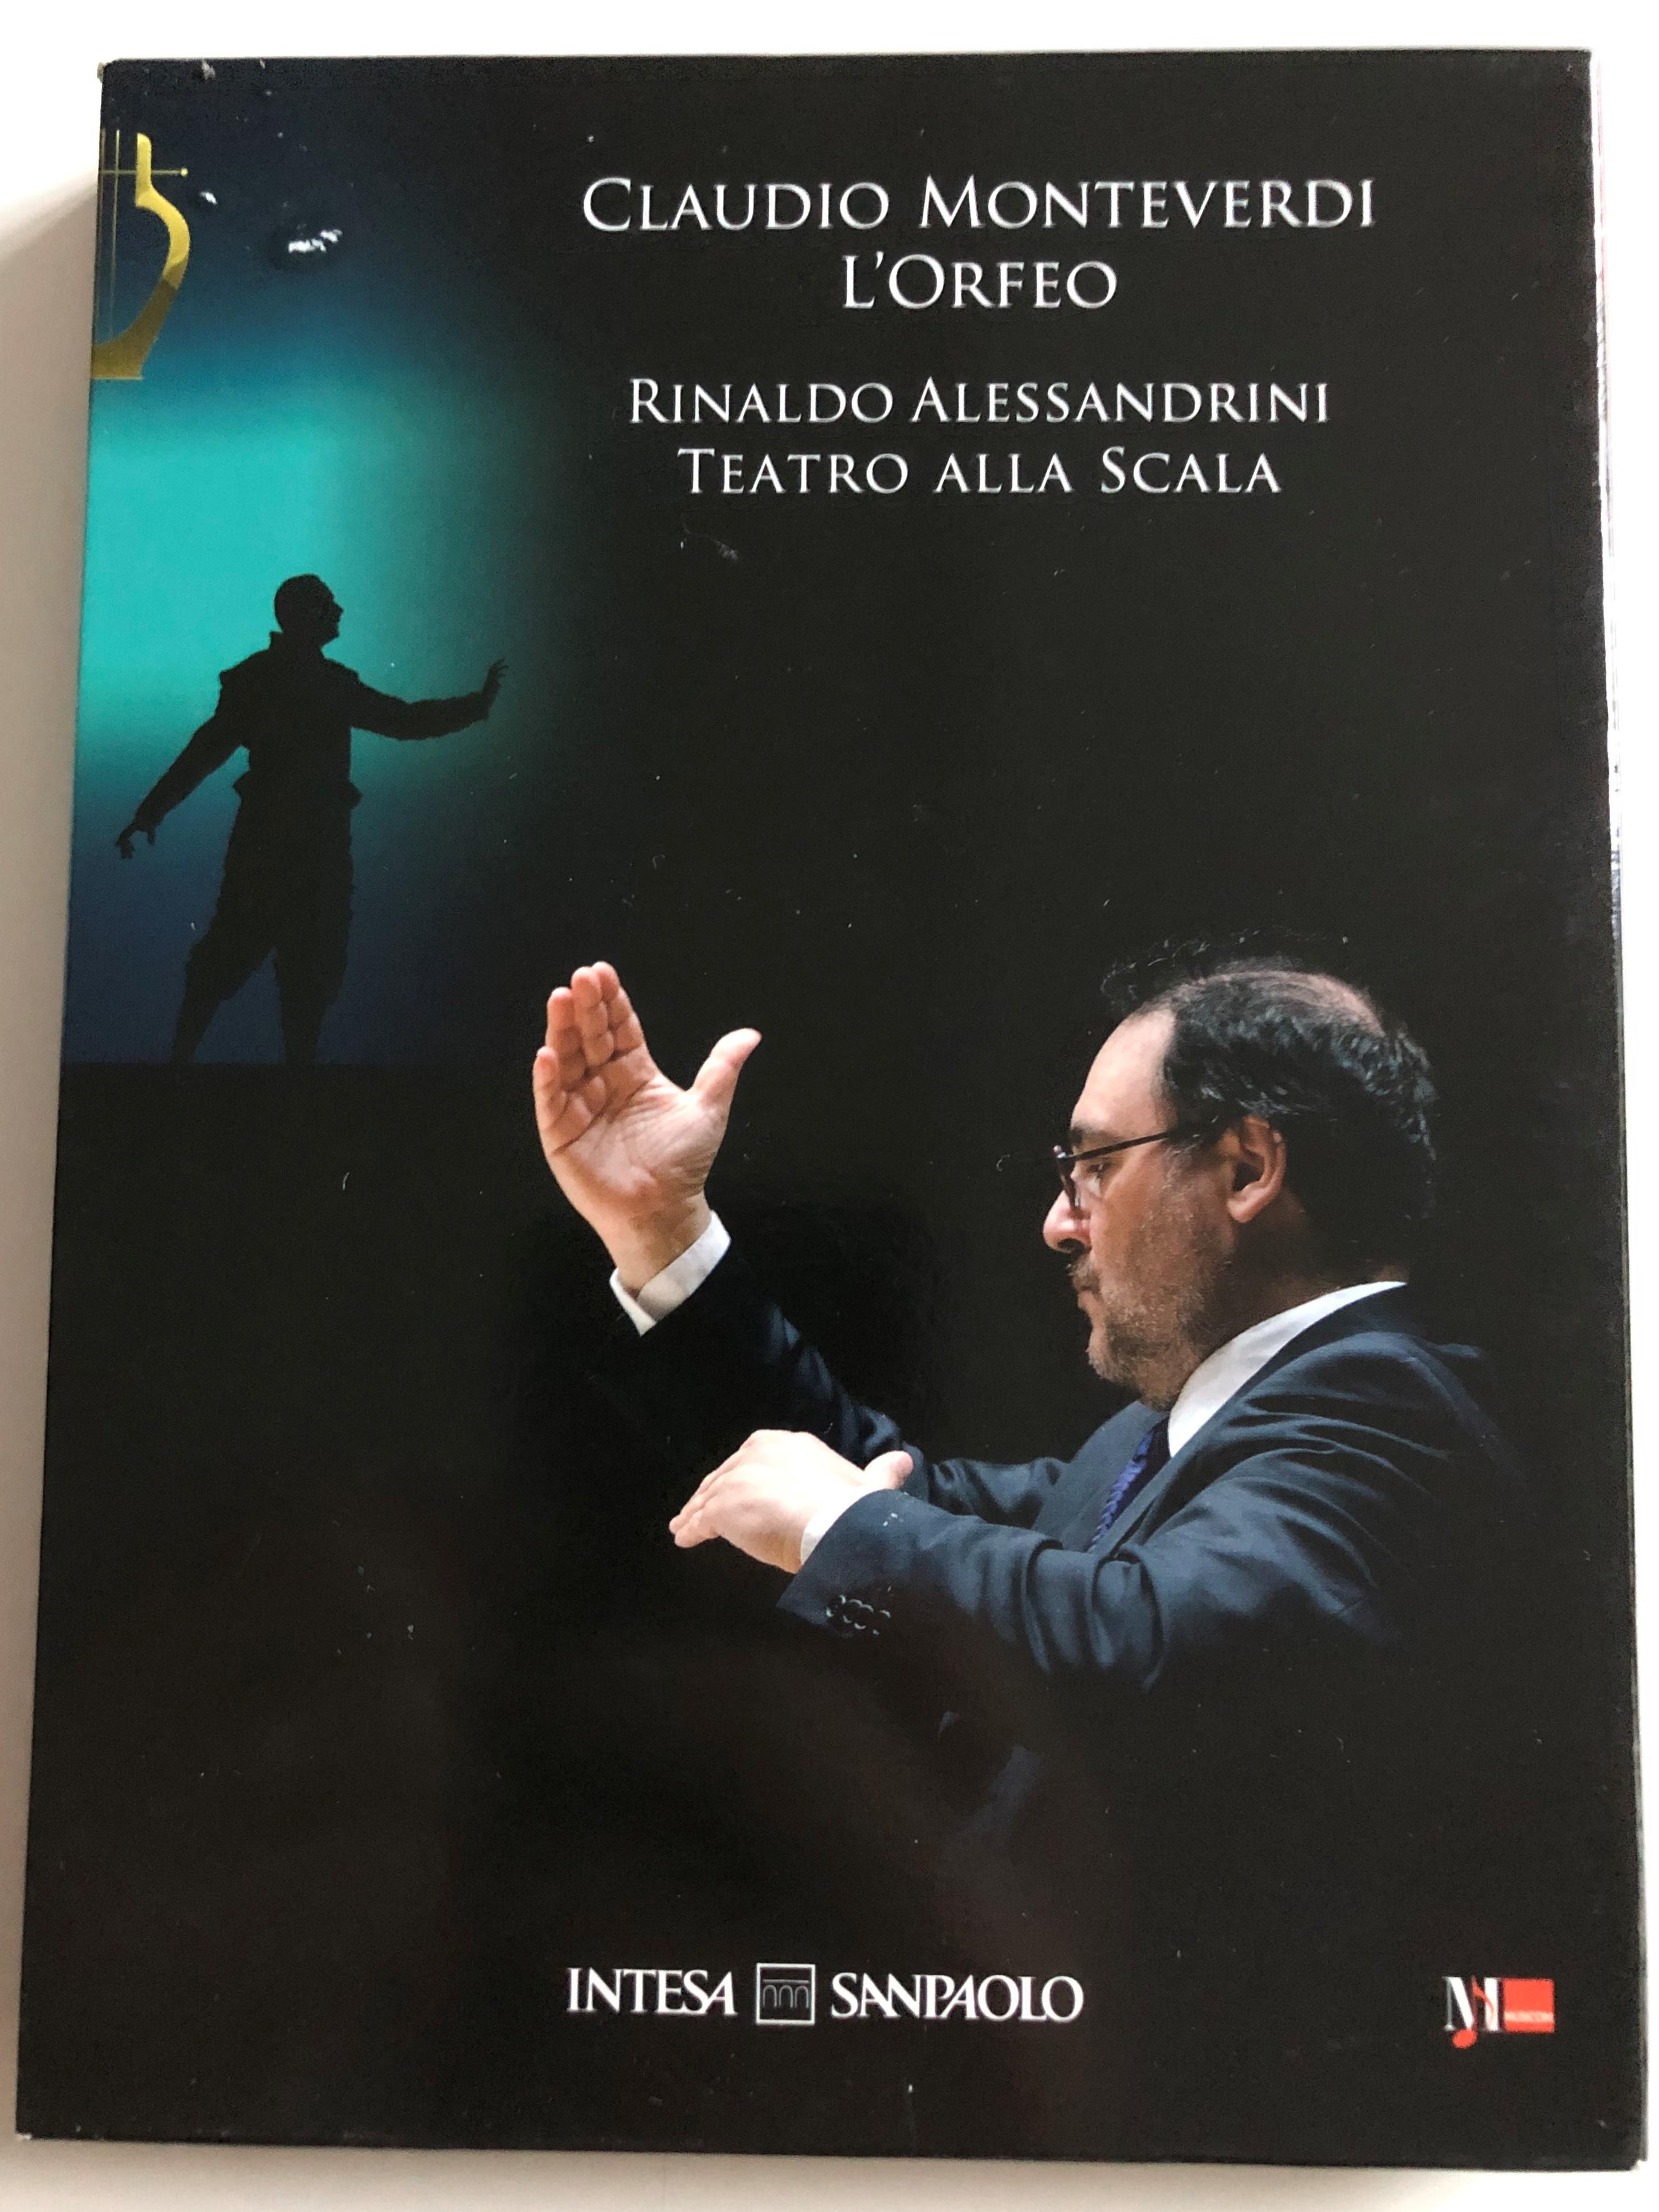 -claudio-monteverdi-l-orfeo-cd-dvd-2010-conducted-by-rinaldo-alessandrini-teatro-alla-scala-directed-by-robert-wilson-1-.jpg